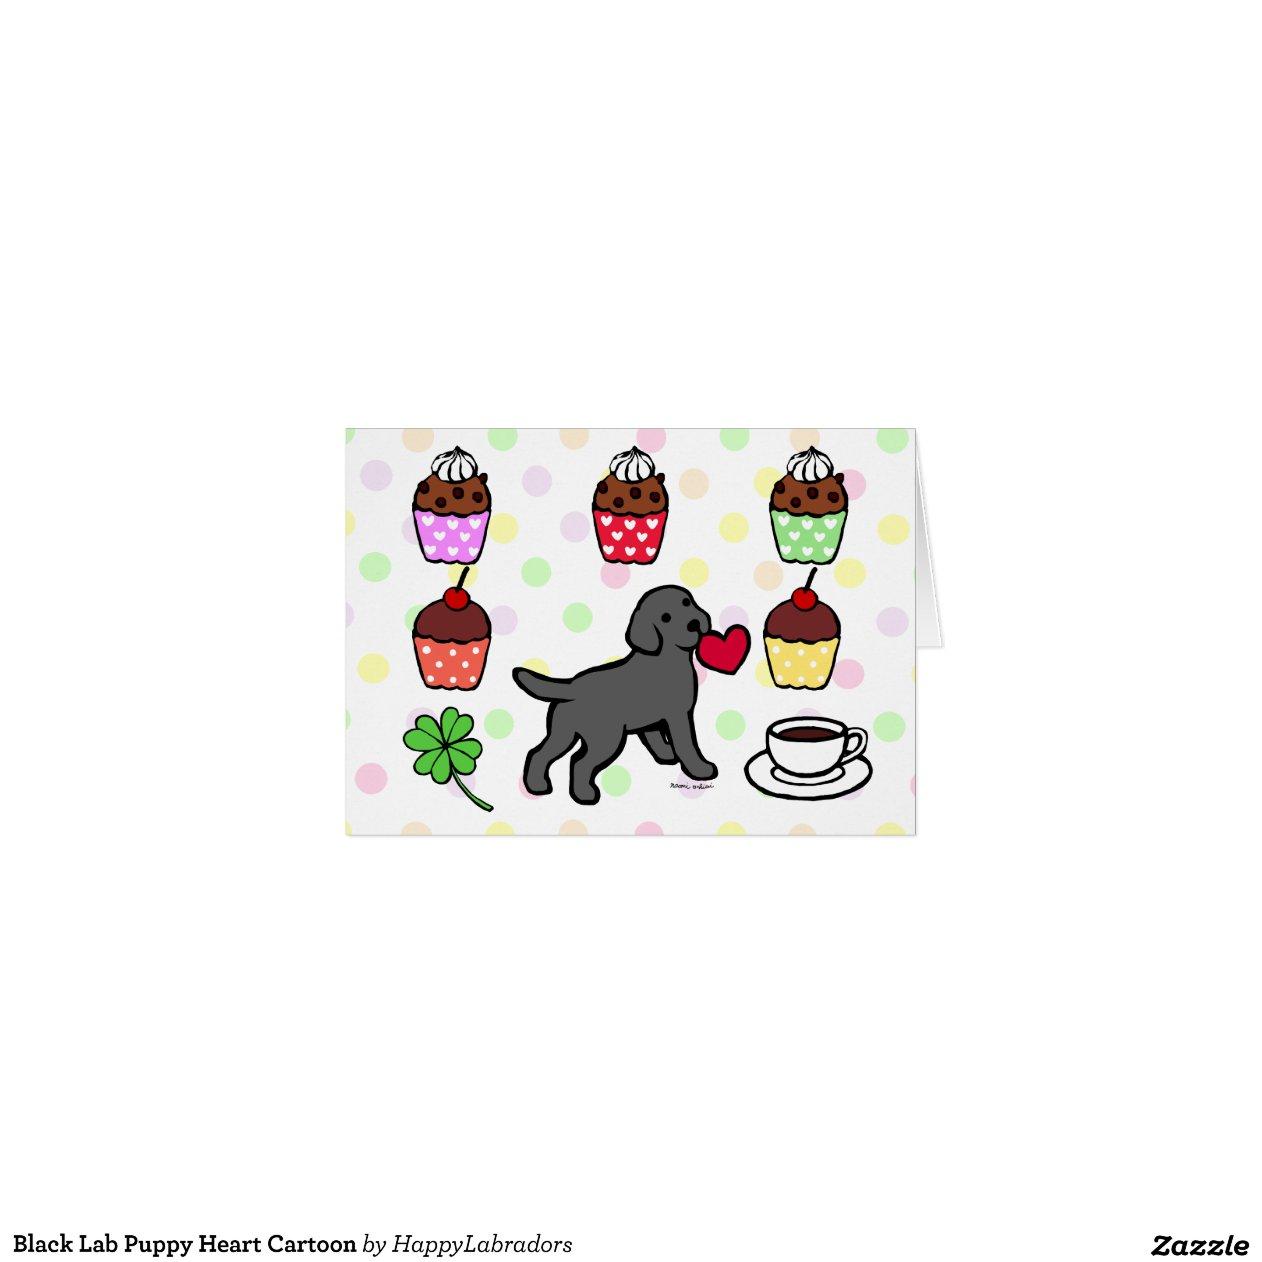 Black Lab Puppy Stock Images RoyaltyFree Images